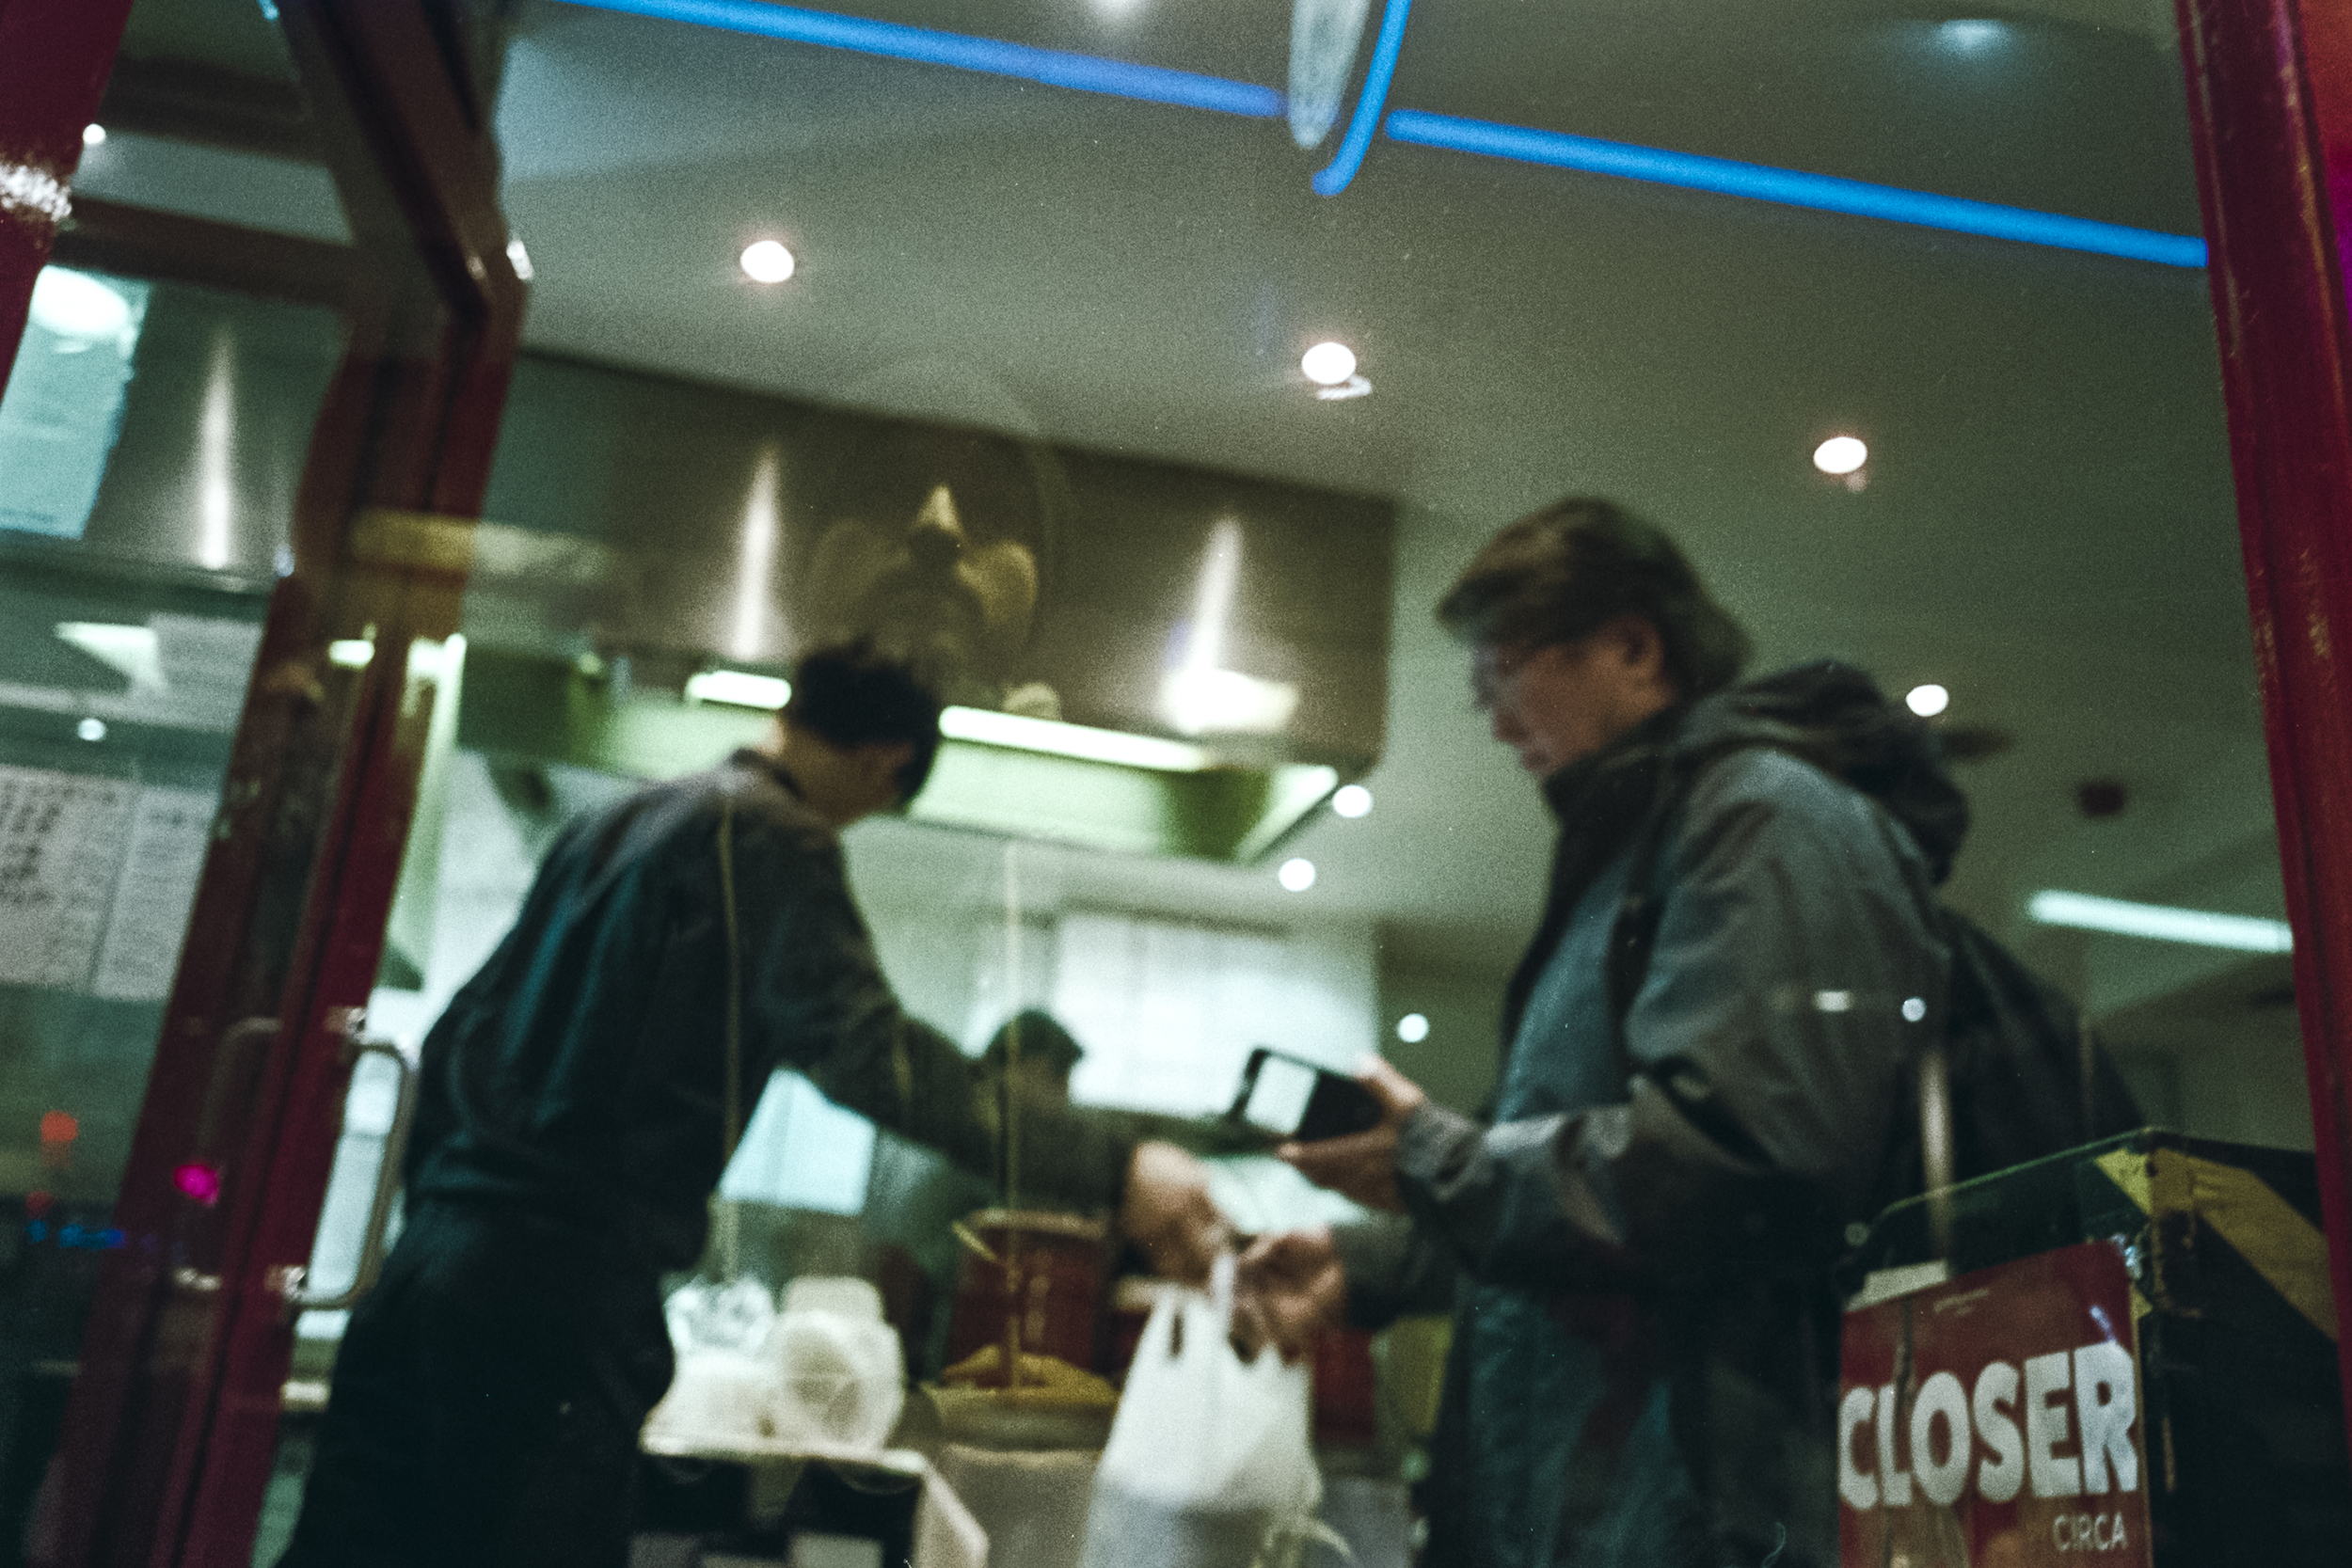 Oscar-arribas-photography-fotografo-portrait-retrato-editorial-london-street-photography-urbana-londres-film-analog-35mm-night-nocturna-56.jpg